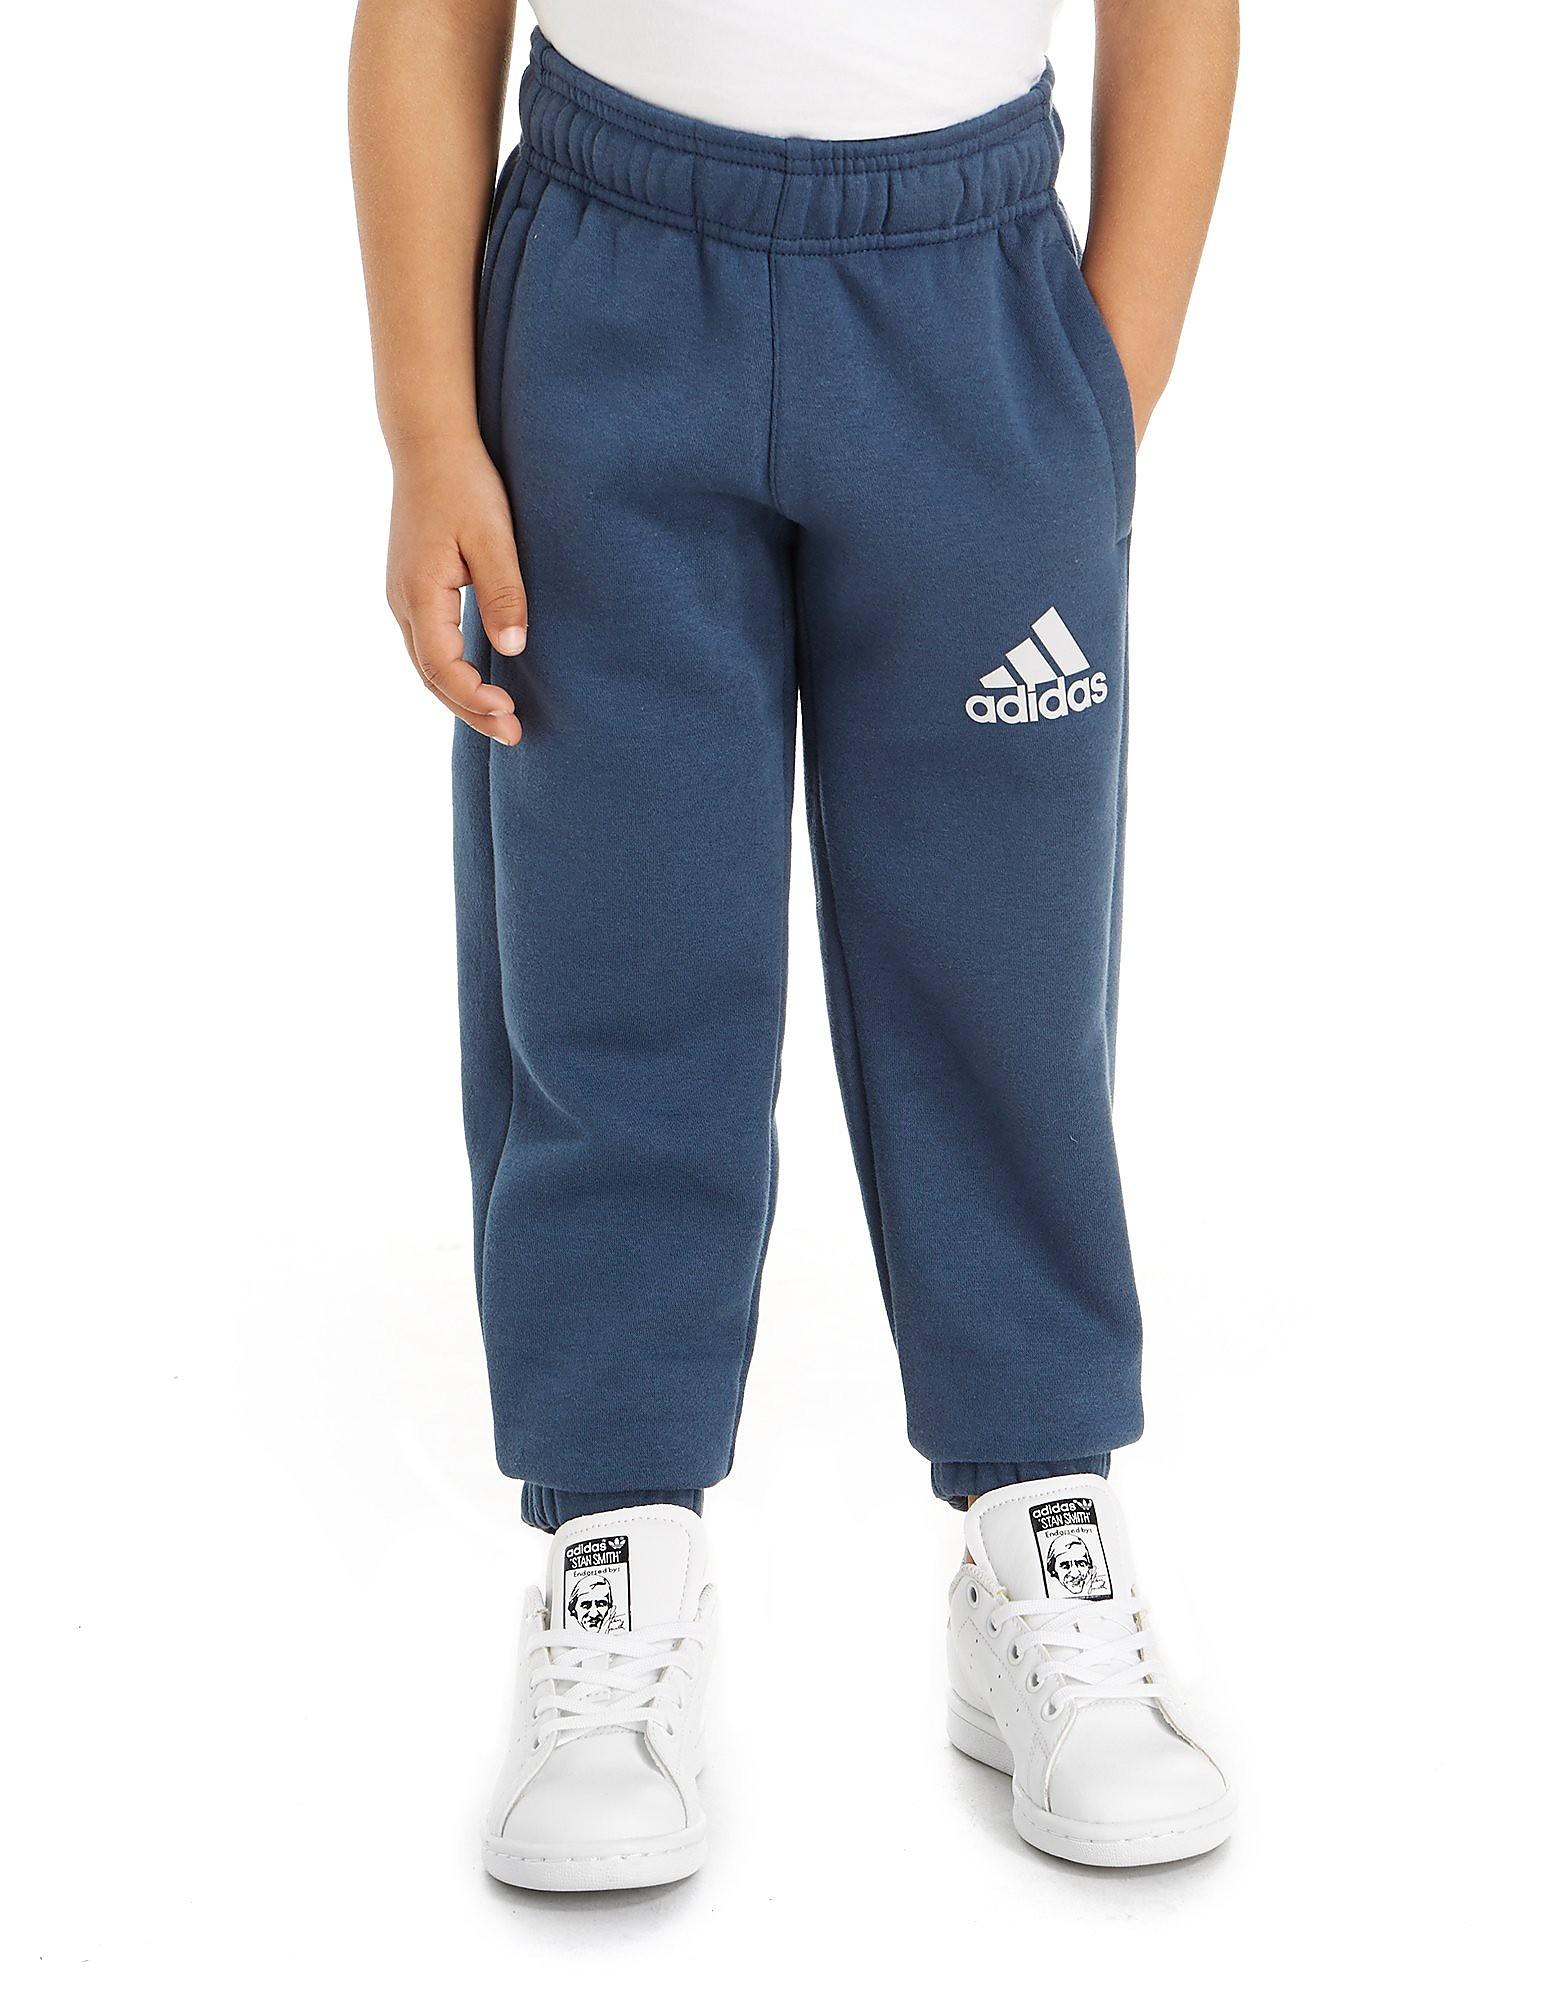 adidas Essentials Track Pants Children